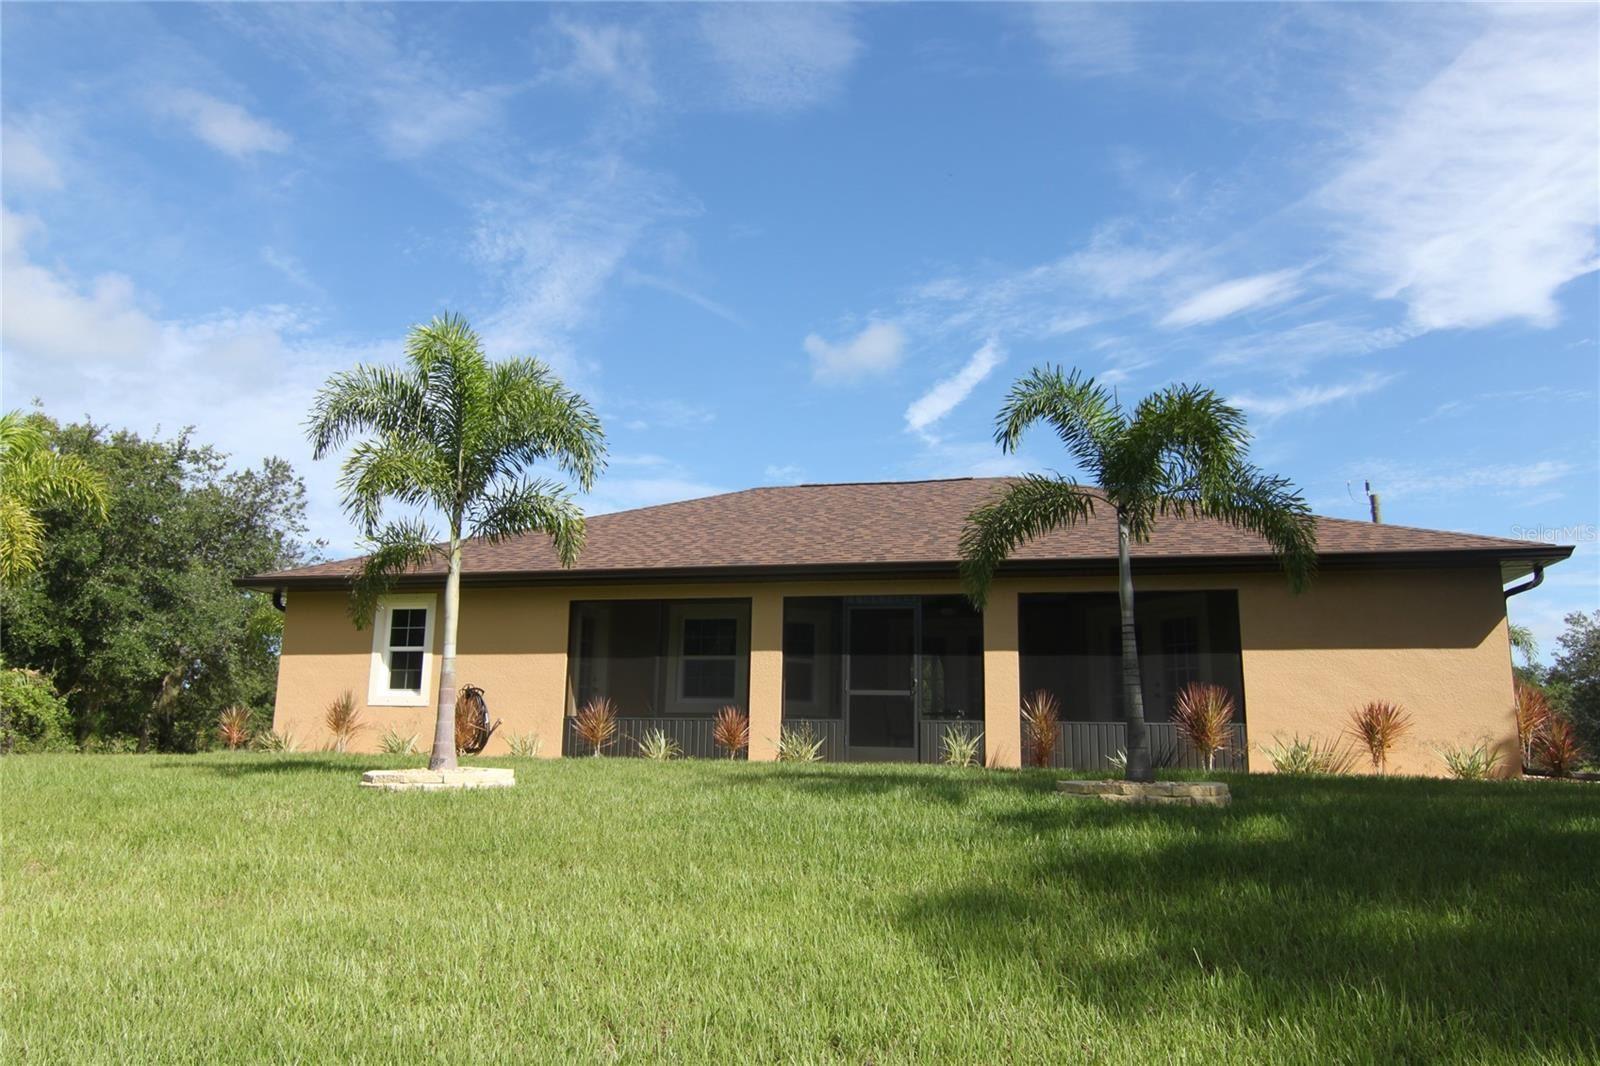 Photo of 82 PELTON CIRCLE, PORT CHARLOTTE, FL 33954 (MLS # C7446265)